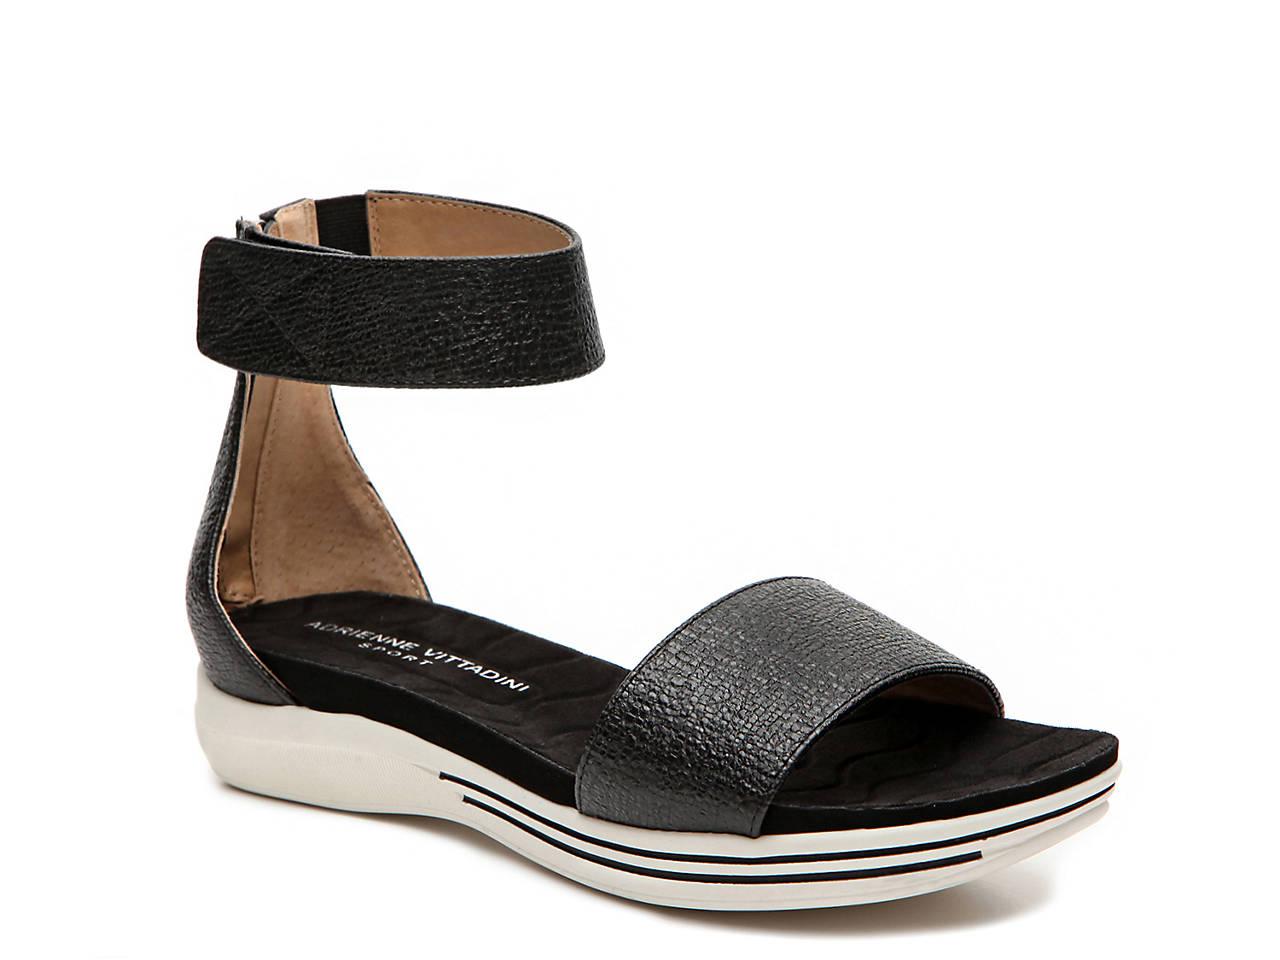 96395da837f Adrienne Vittadini Sport Carlos Wedge Sandal Women s Shoes